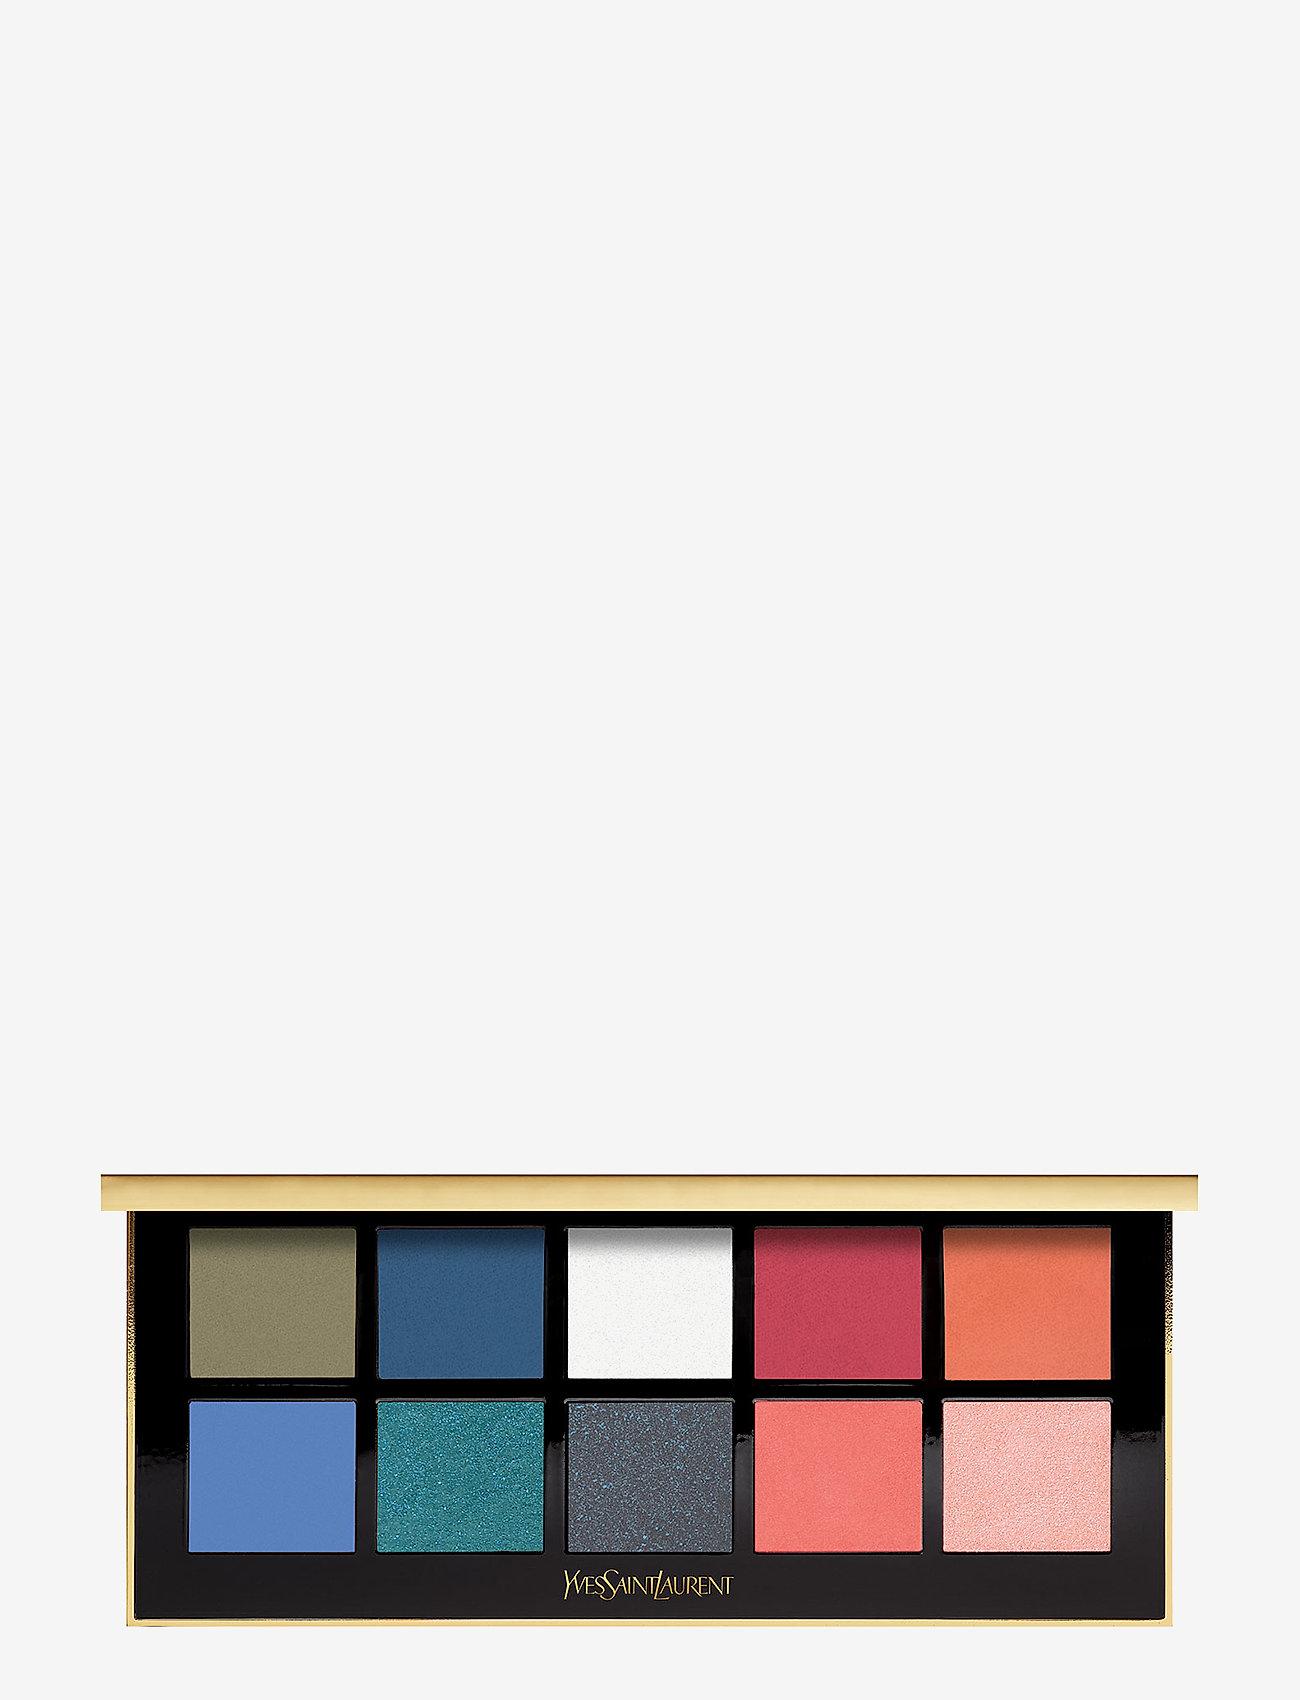 Yves Saint Laurent - YSL Couture Colour Clutch Marrakech - Ögonskuggspalett - marrakech - 0